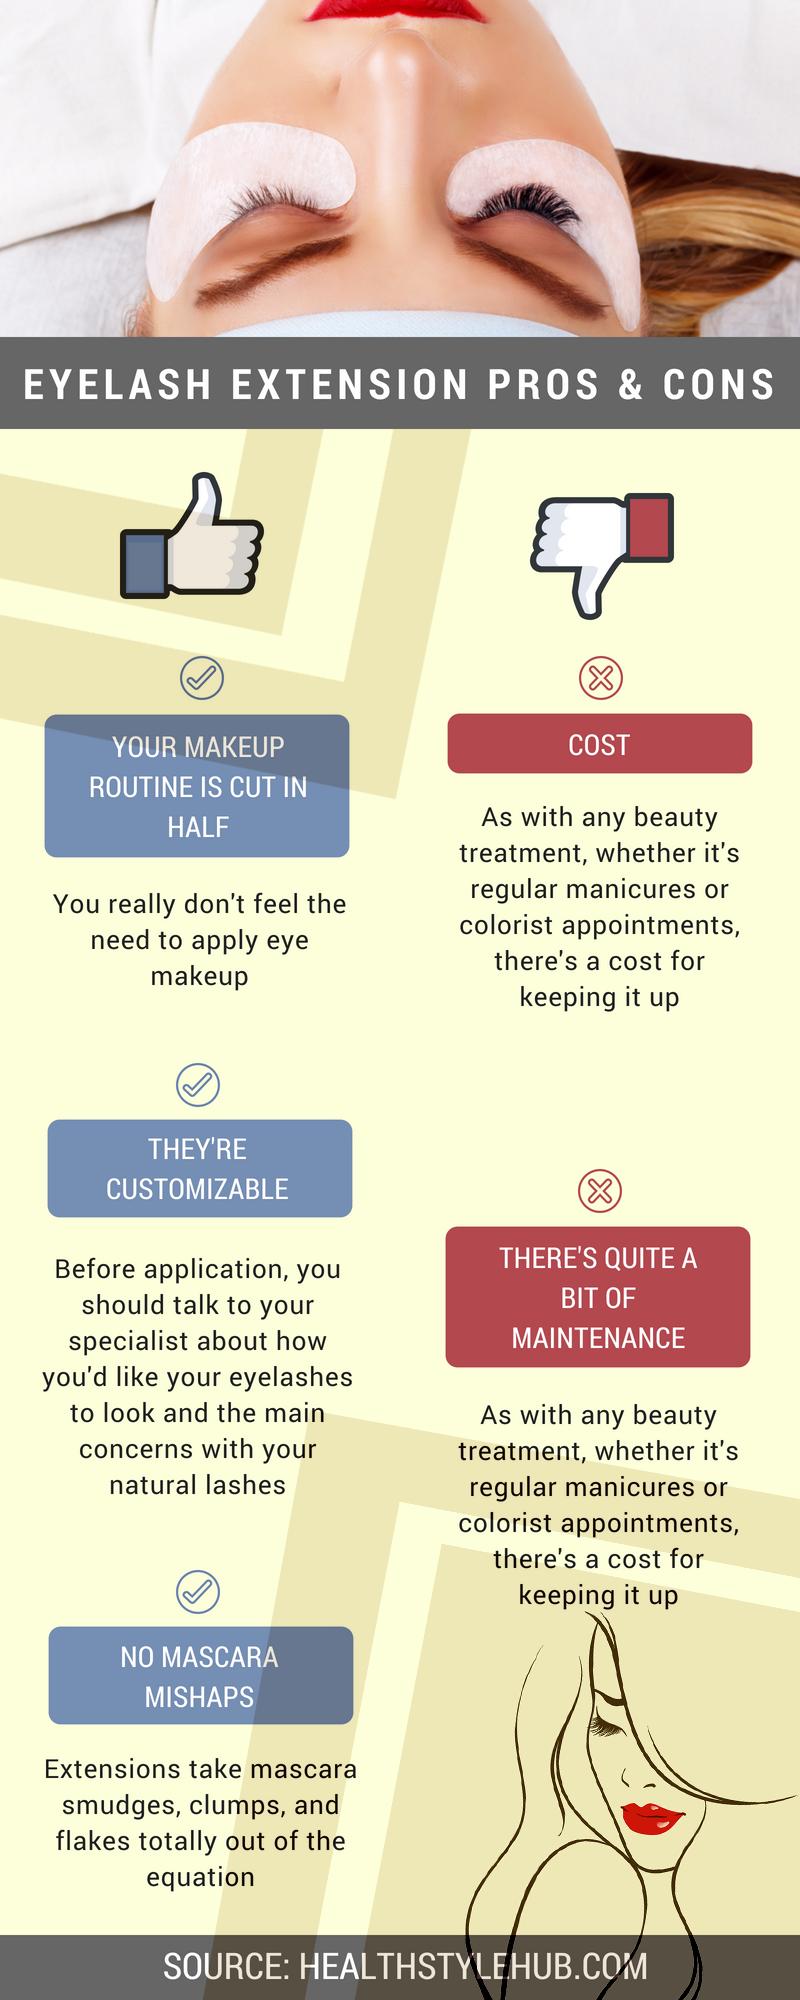 eyelash extension pros cons   Eyelash extensions, Eyelash ...